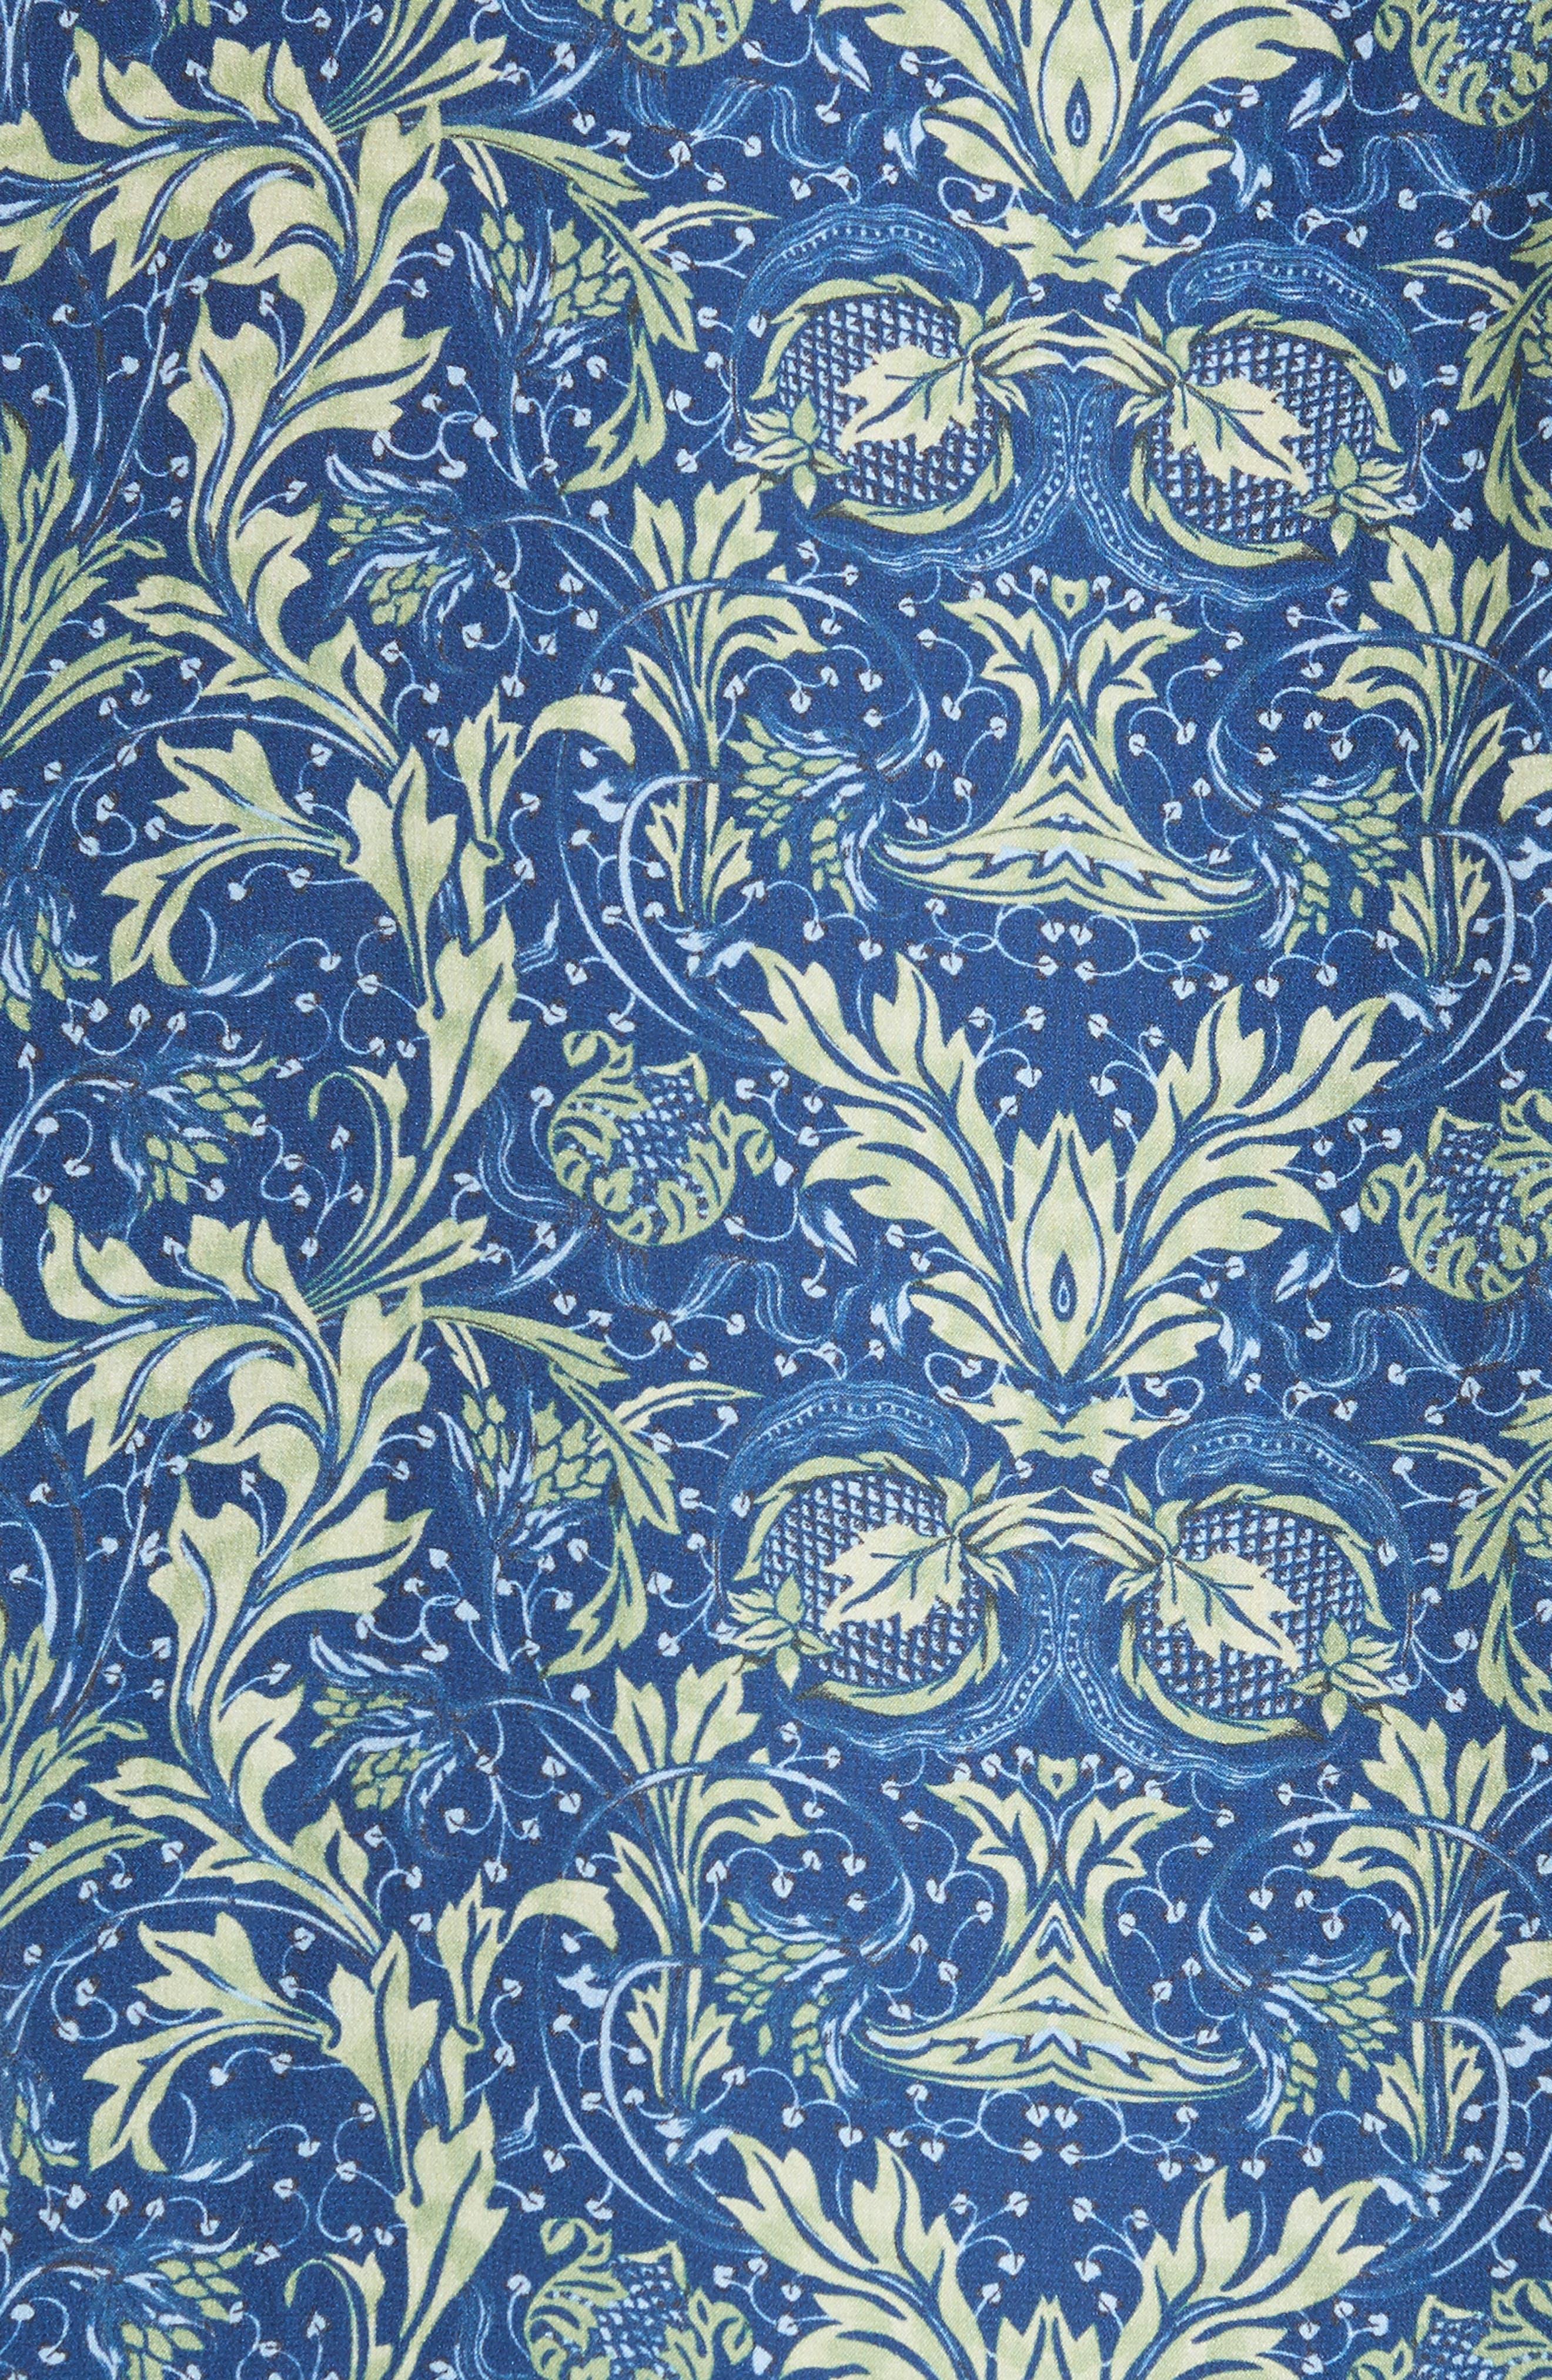 Acanthus Print Silk Blouse,                             Alternate thumbnail 5, color,                             430